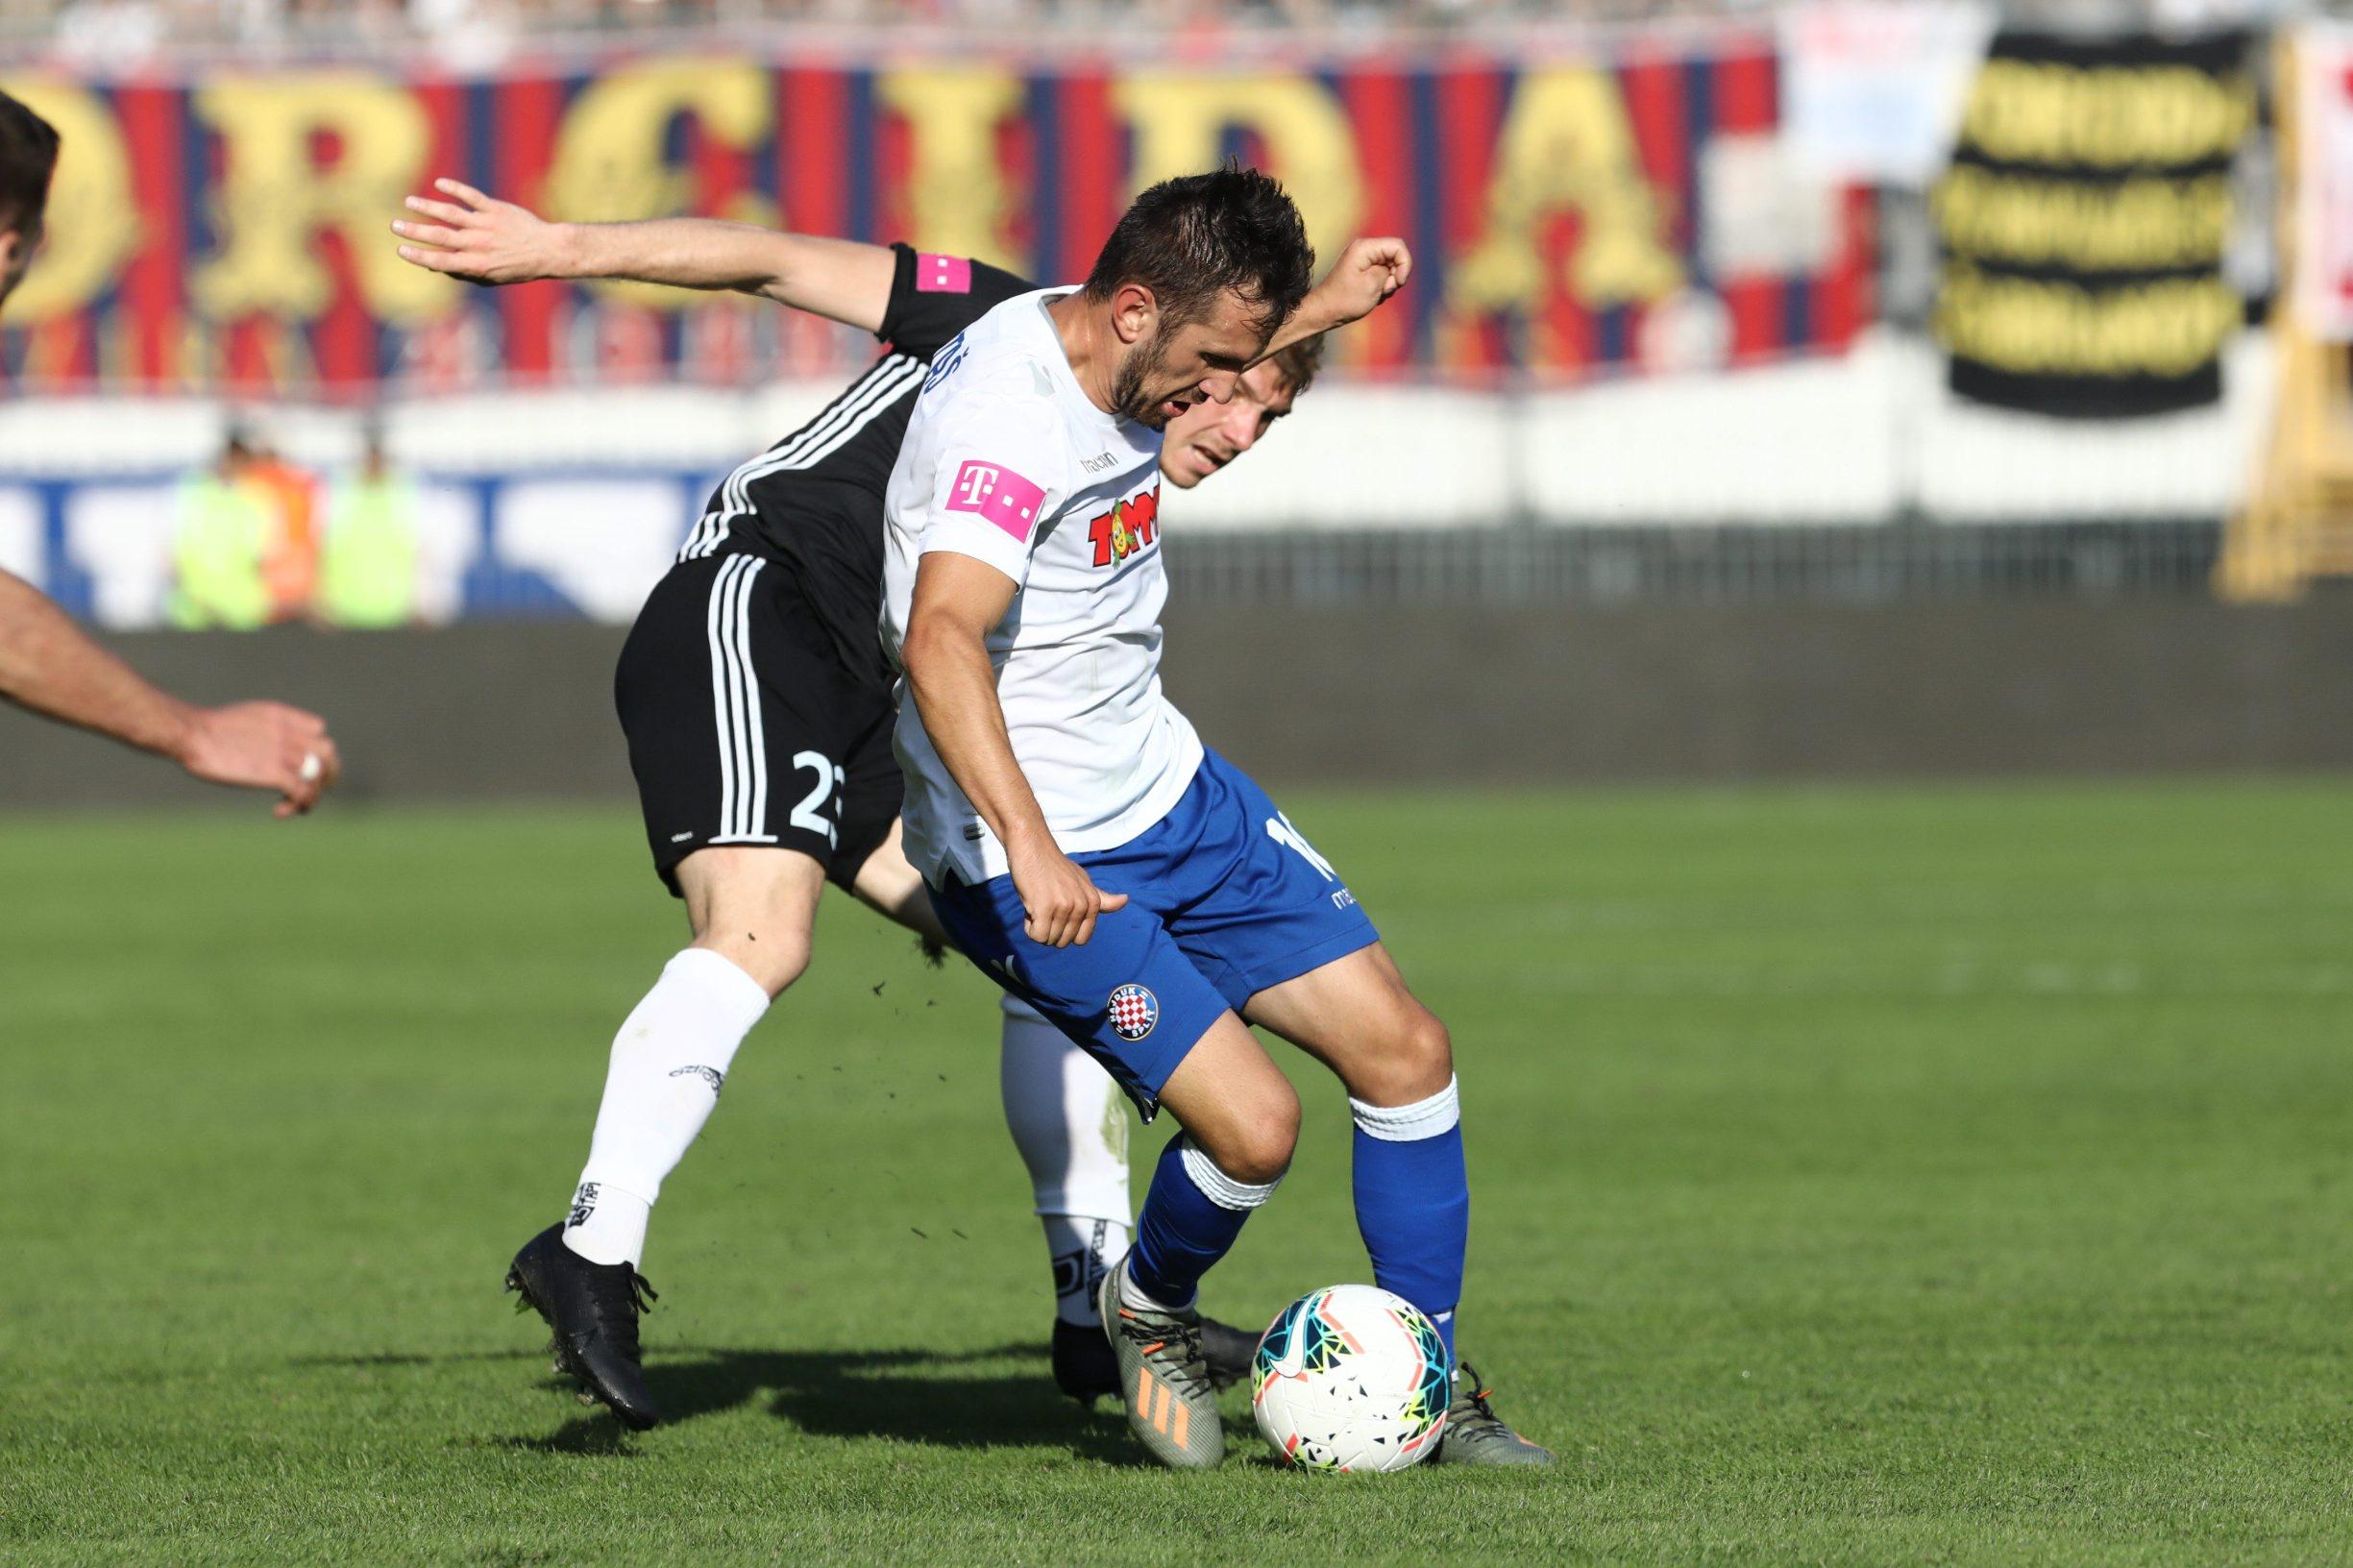 Split, 261019. Stadion u Poljudu. Utakmica 1. HNL izmedju Hajduka i Slaven Belupa. Na fotografiji: Anthony Kalik. Foto: Vojko Basic / CROPIX